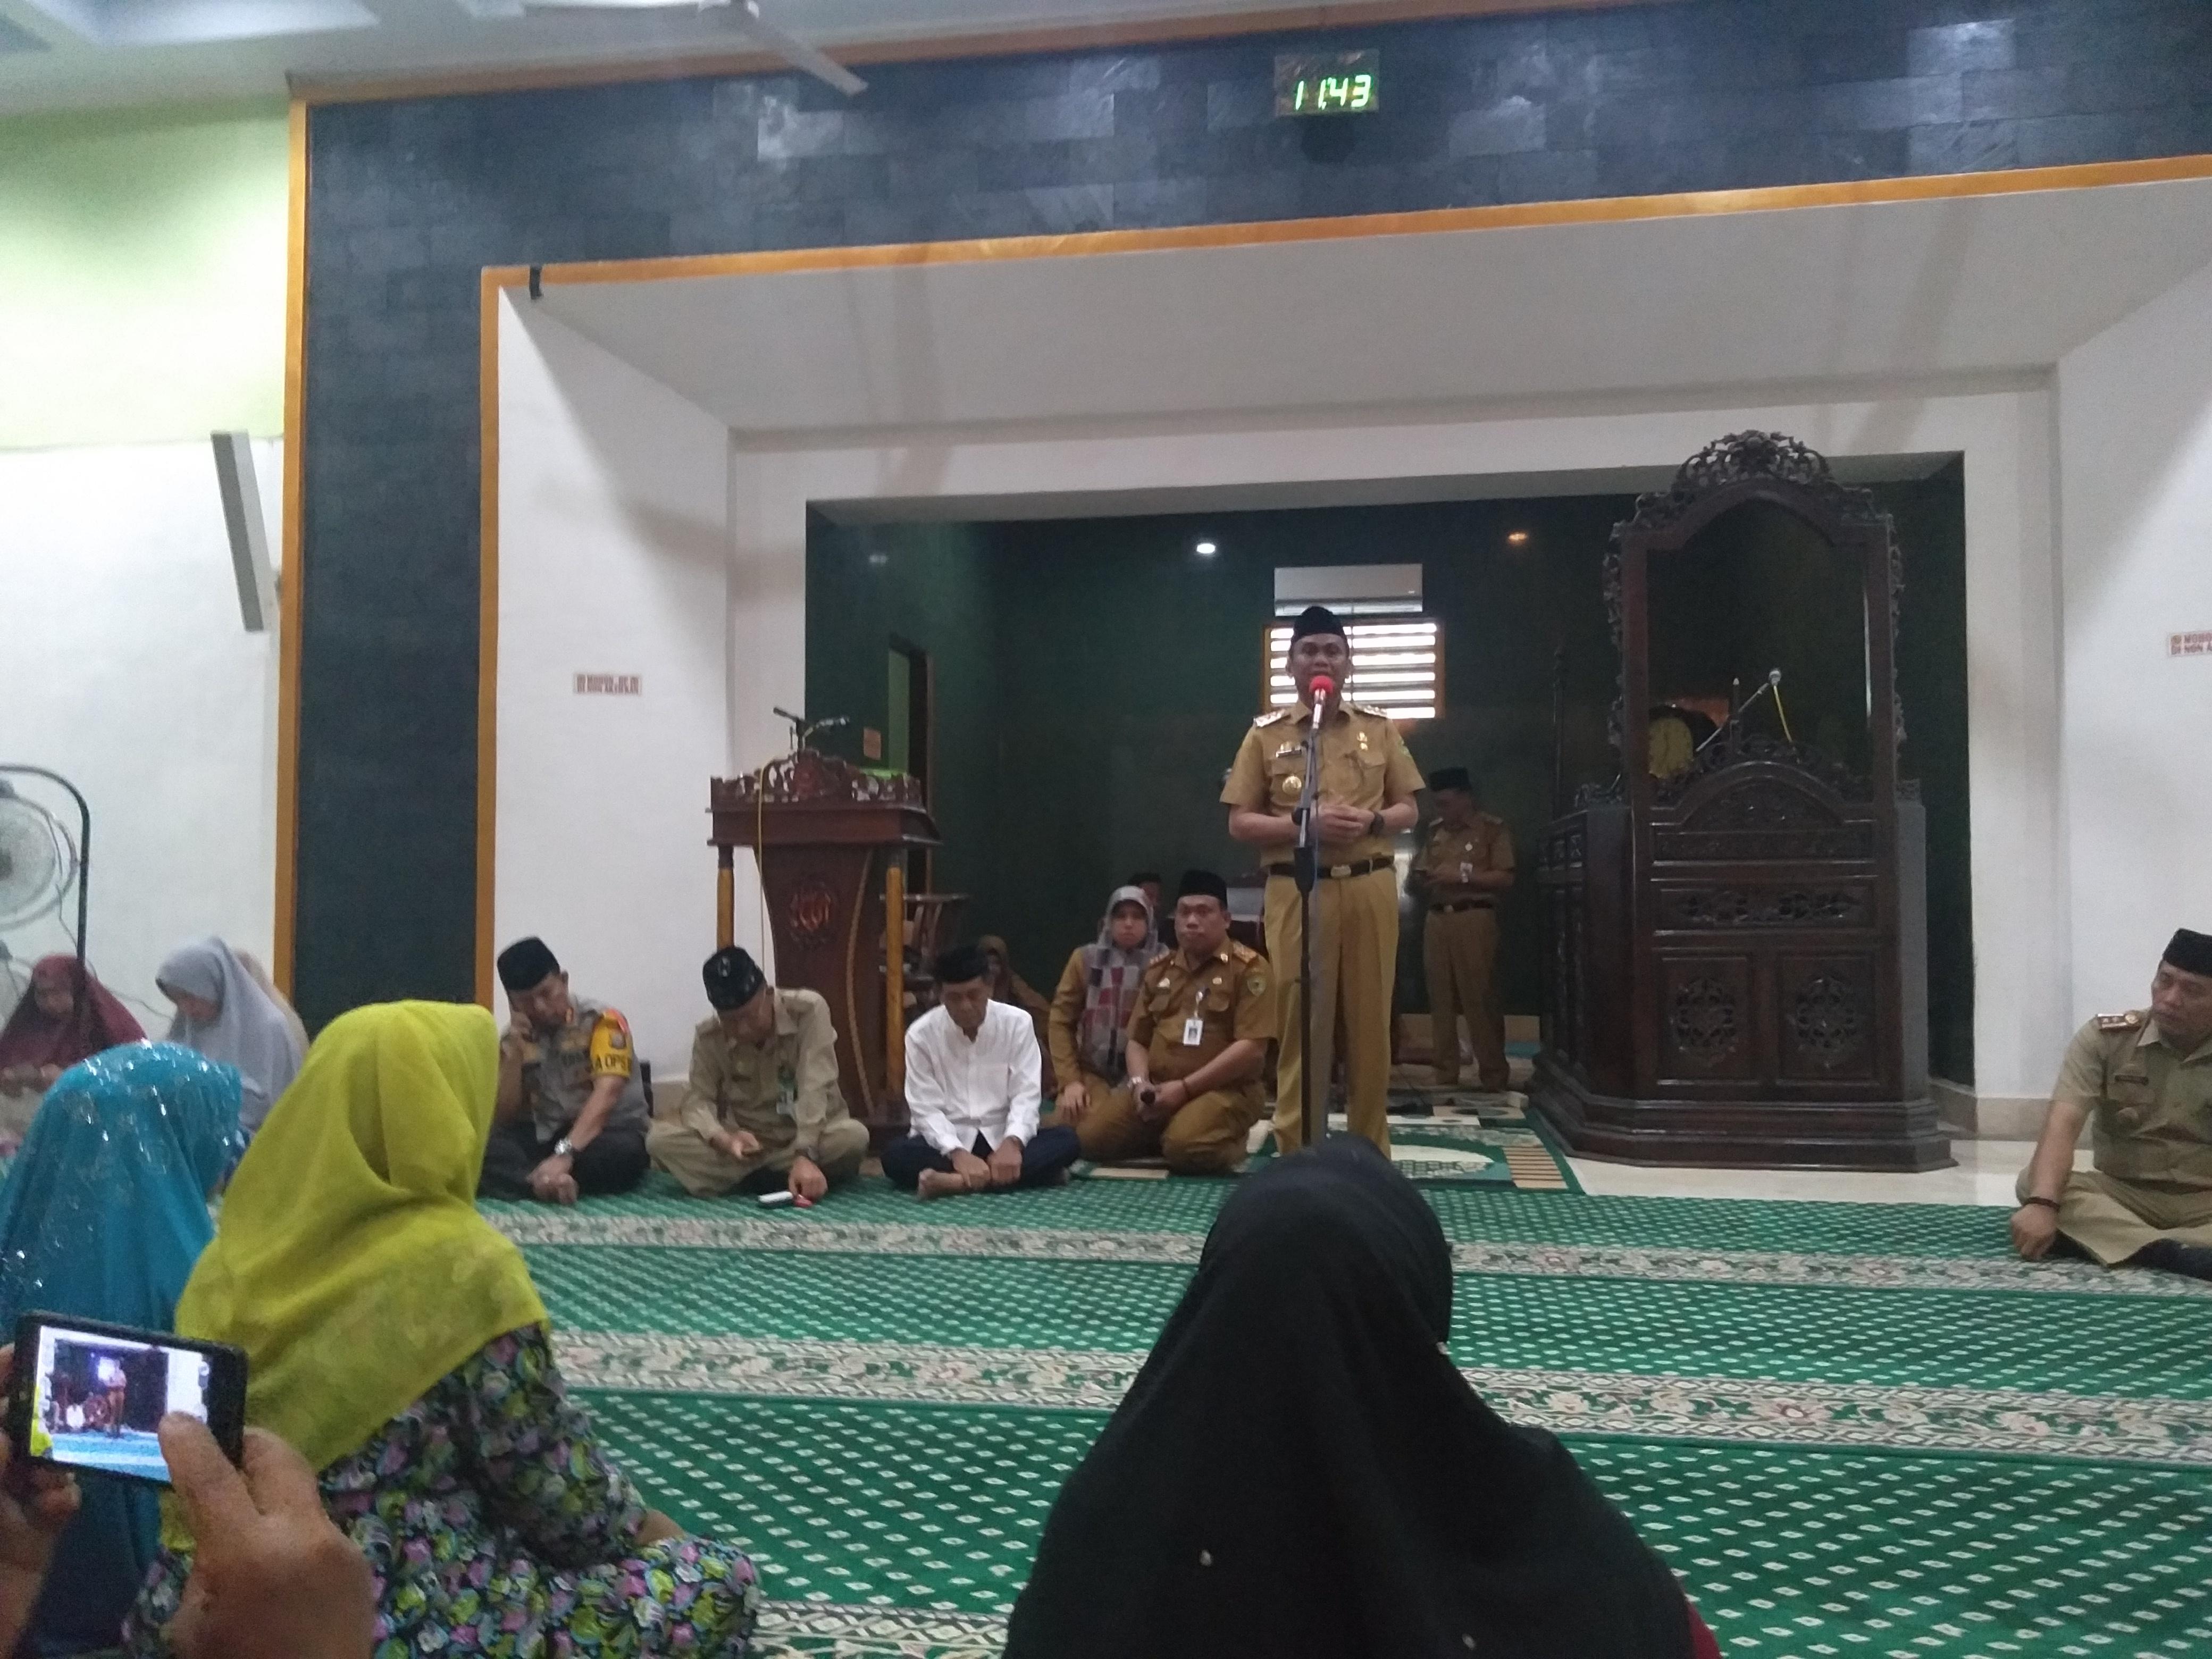 Pemkab Barru Berangkatkan Umrah 100 Guru Mengaji, Pegawai Syara' dan Imam Masjid